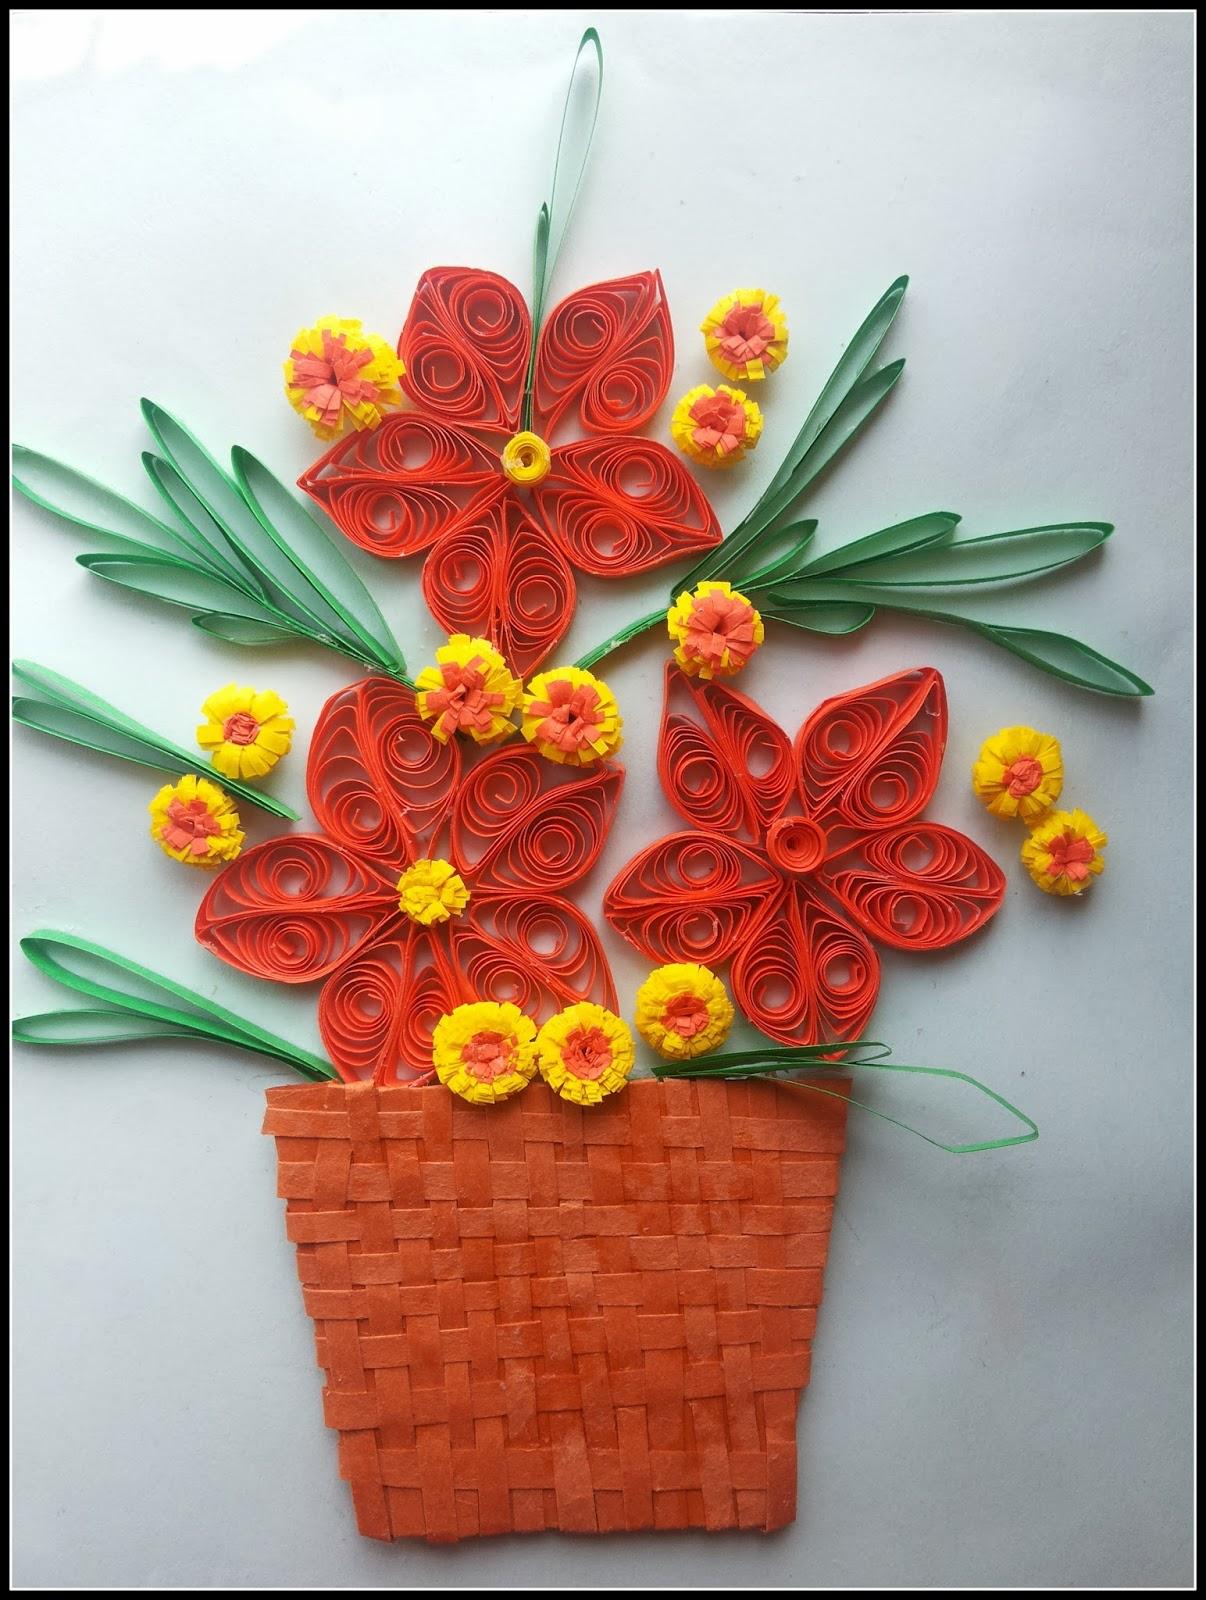 http://quillingzone.blogspot.tw/2014/02/flower-bouquet.html